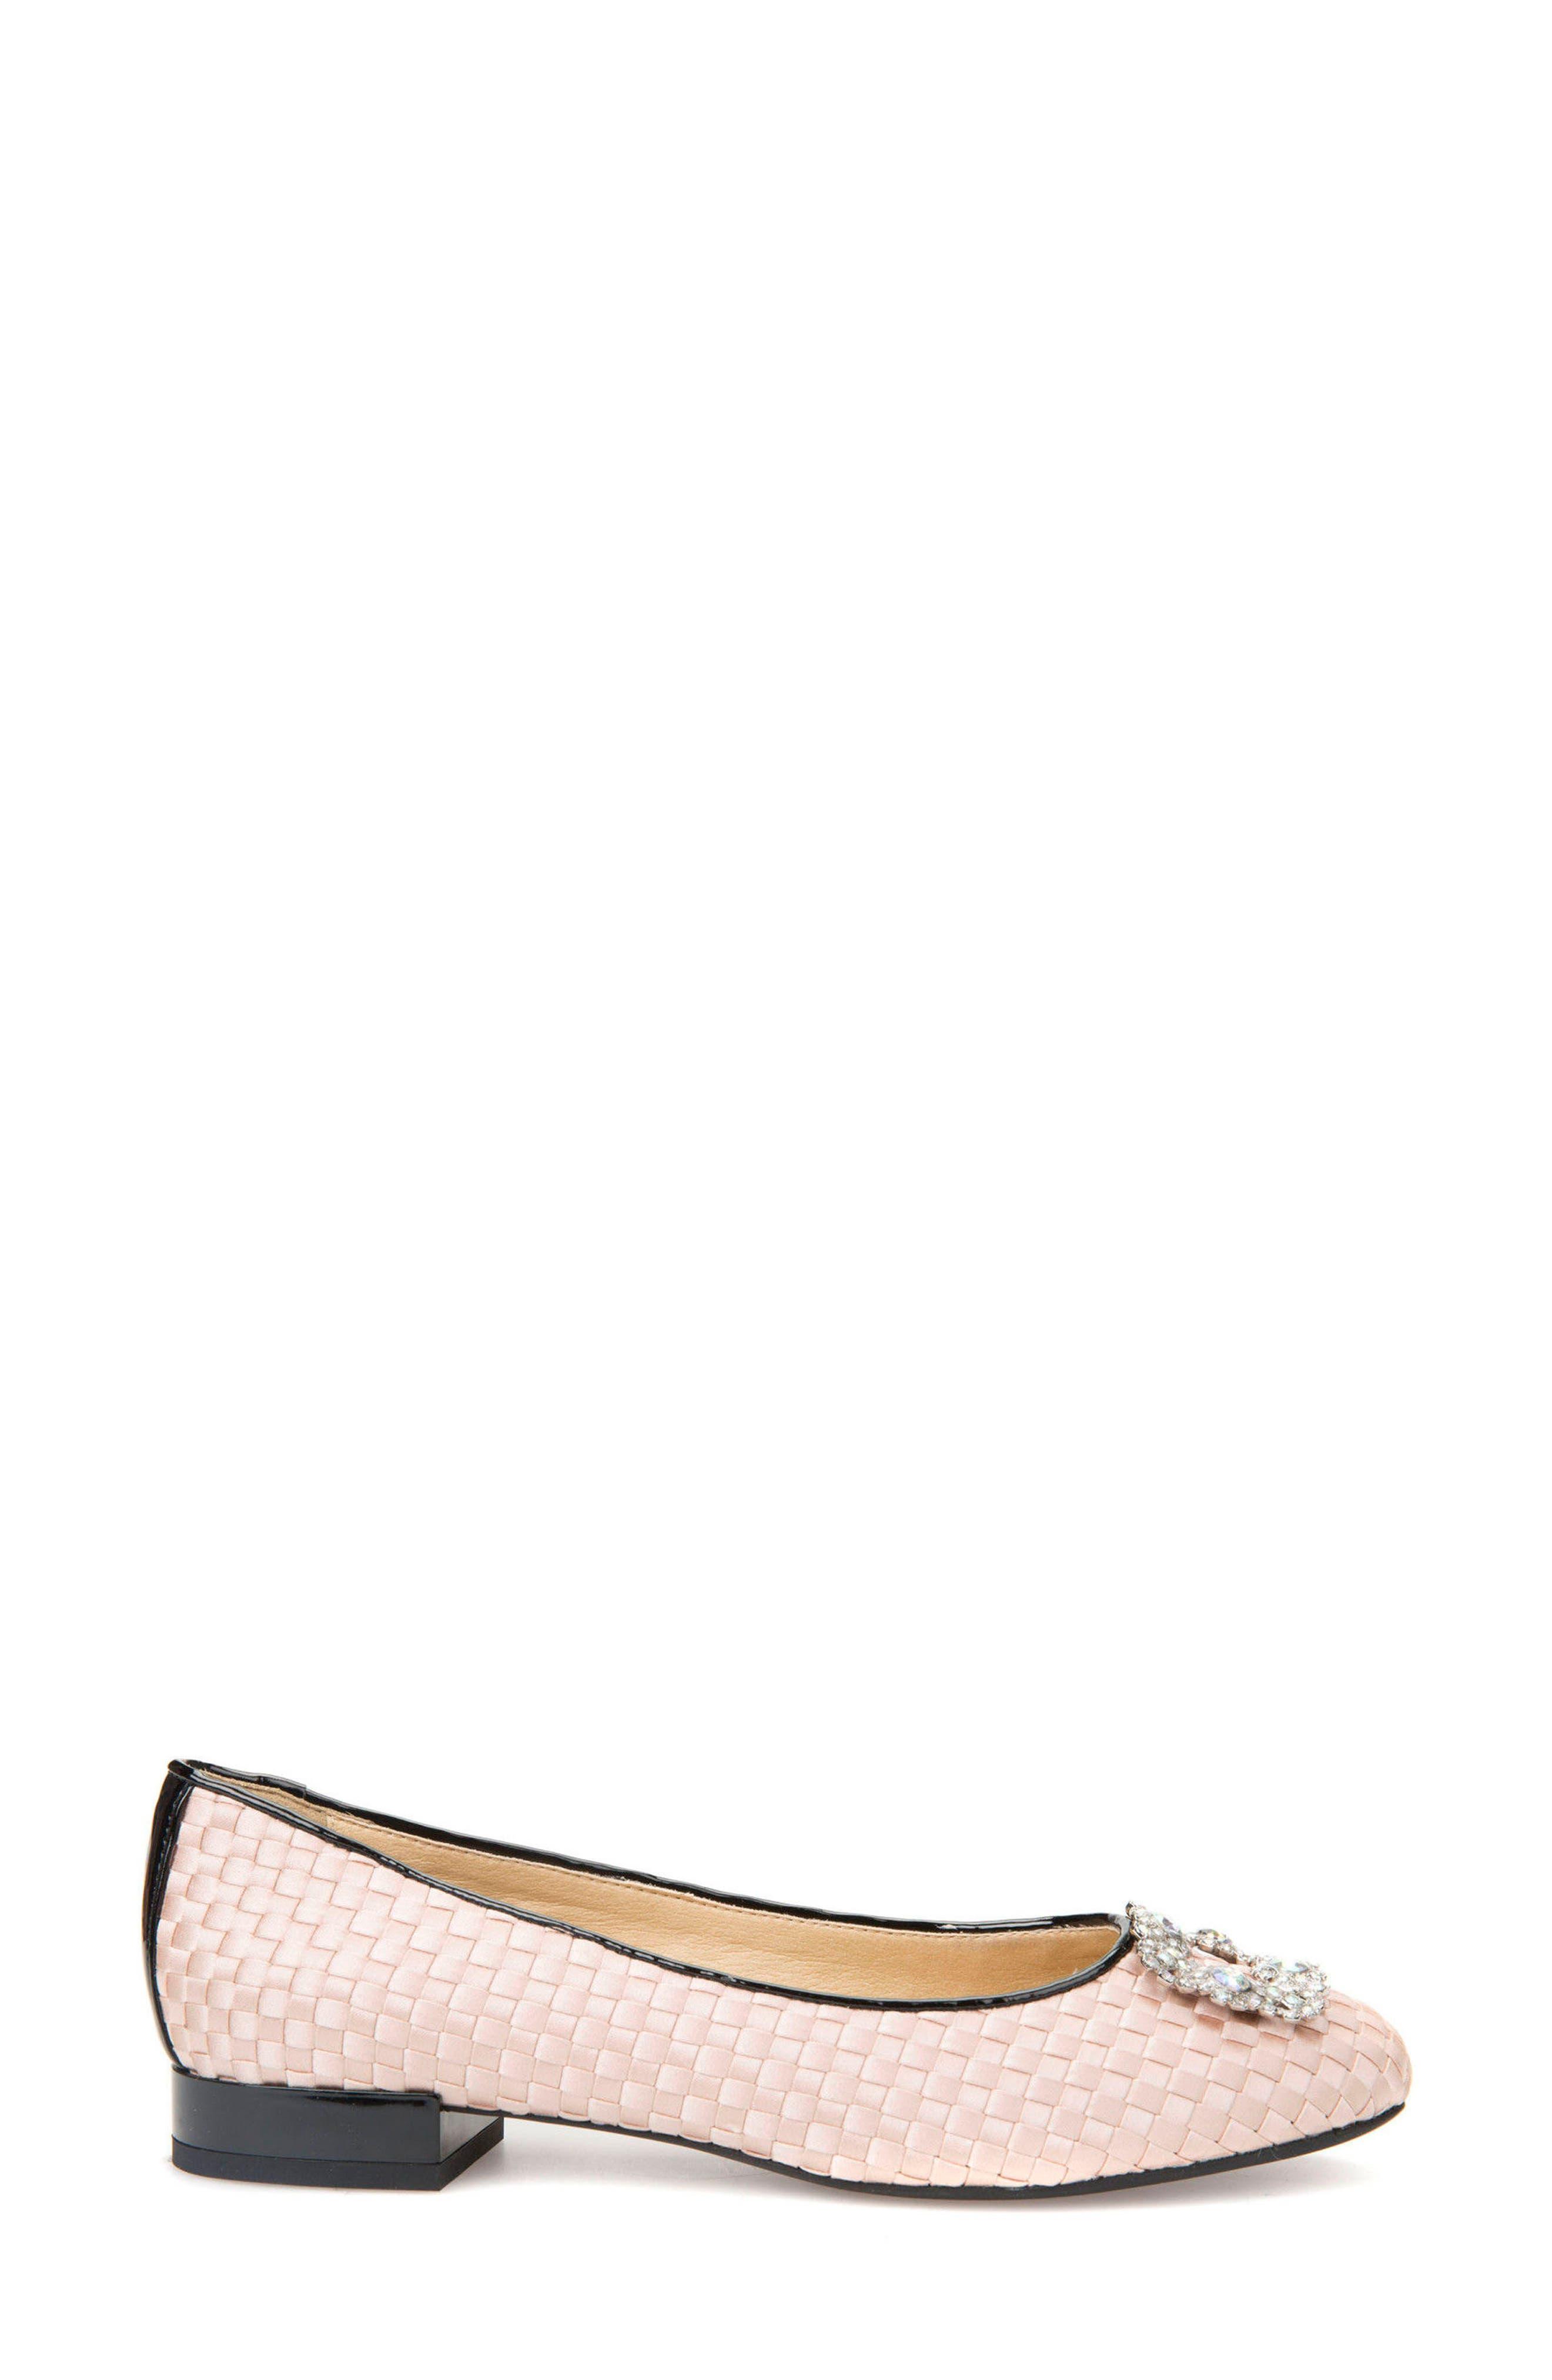 Wistrey Woven Embellished Slip-On,                             Alternate thumbnail 3, color,                             250